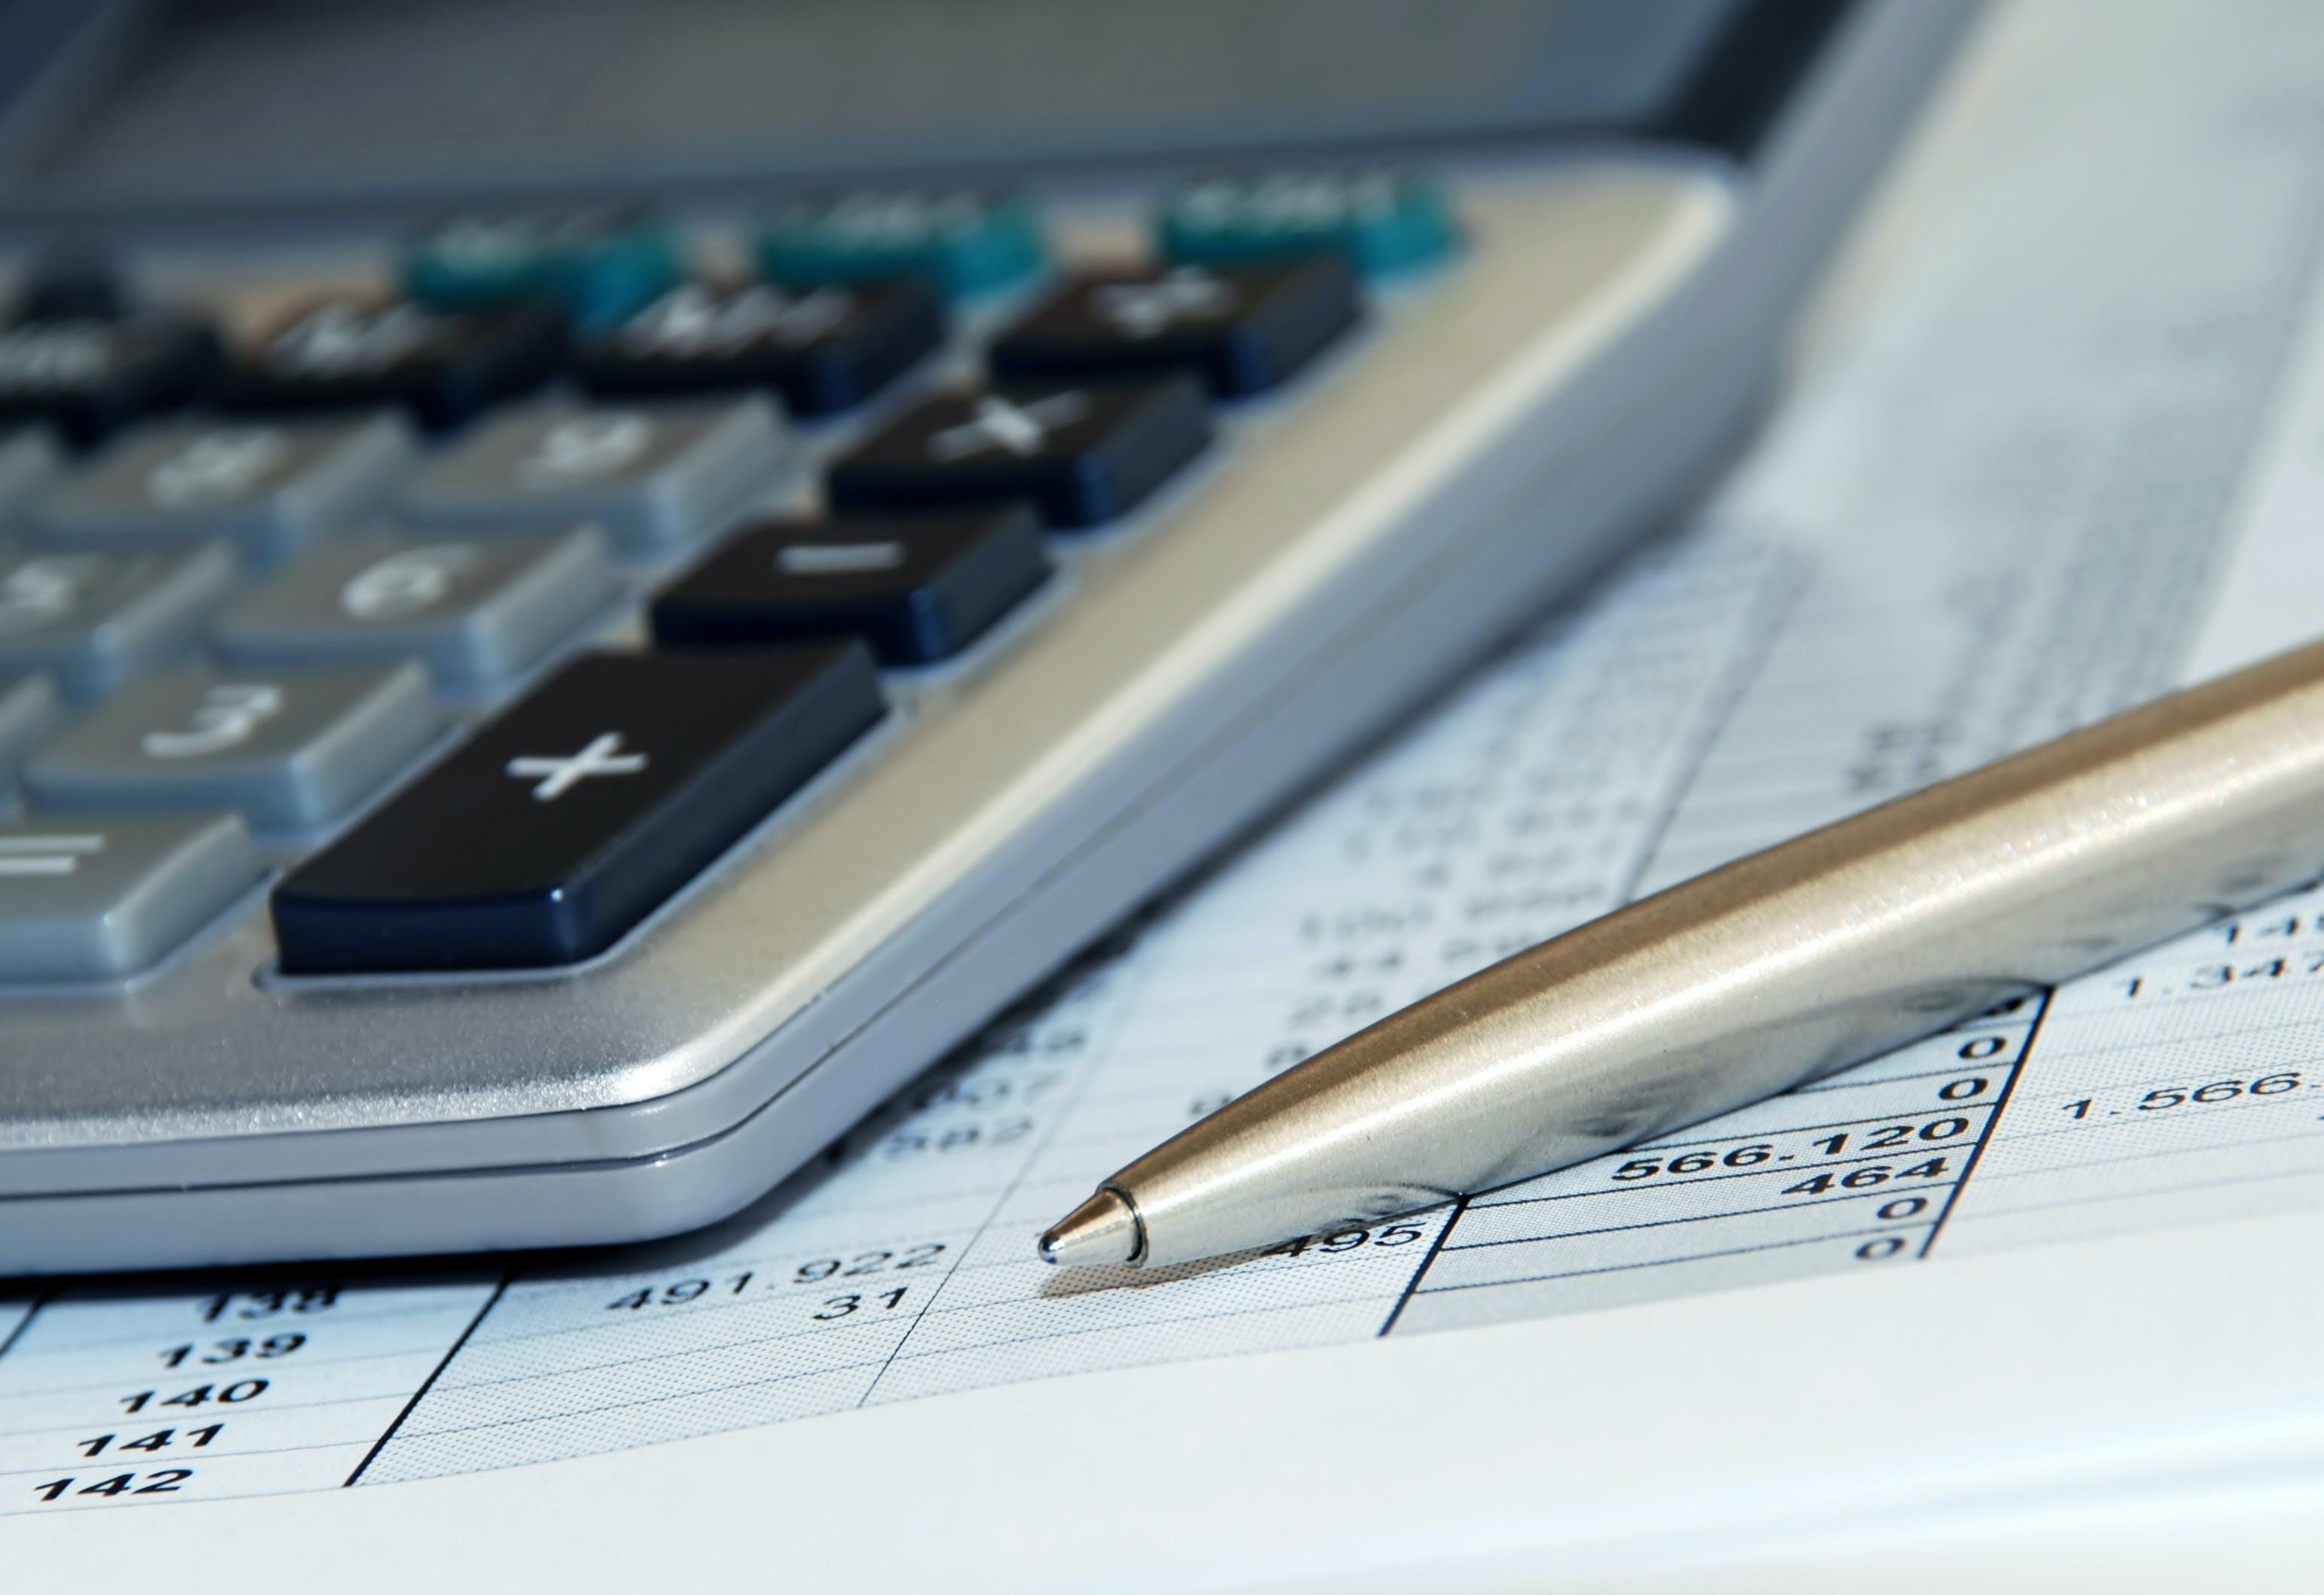 calculatrice et stylo